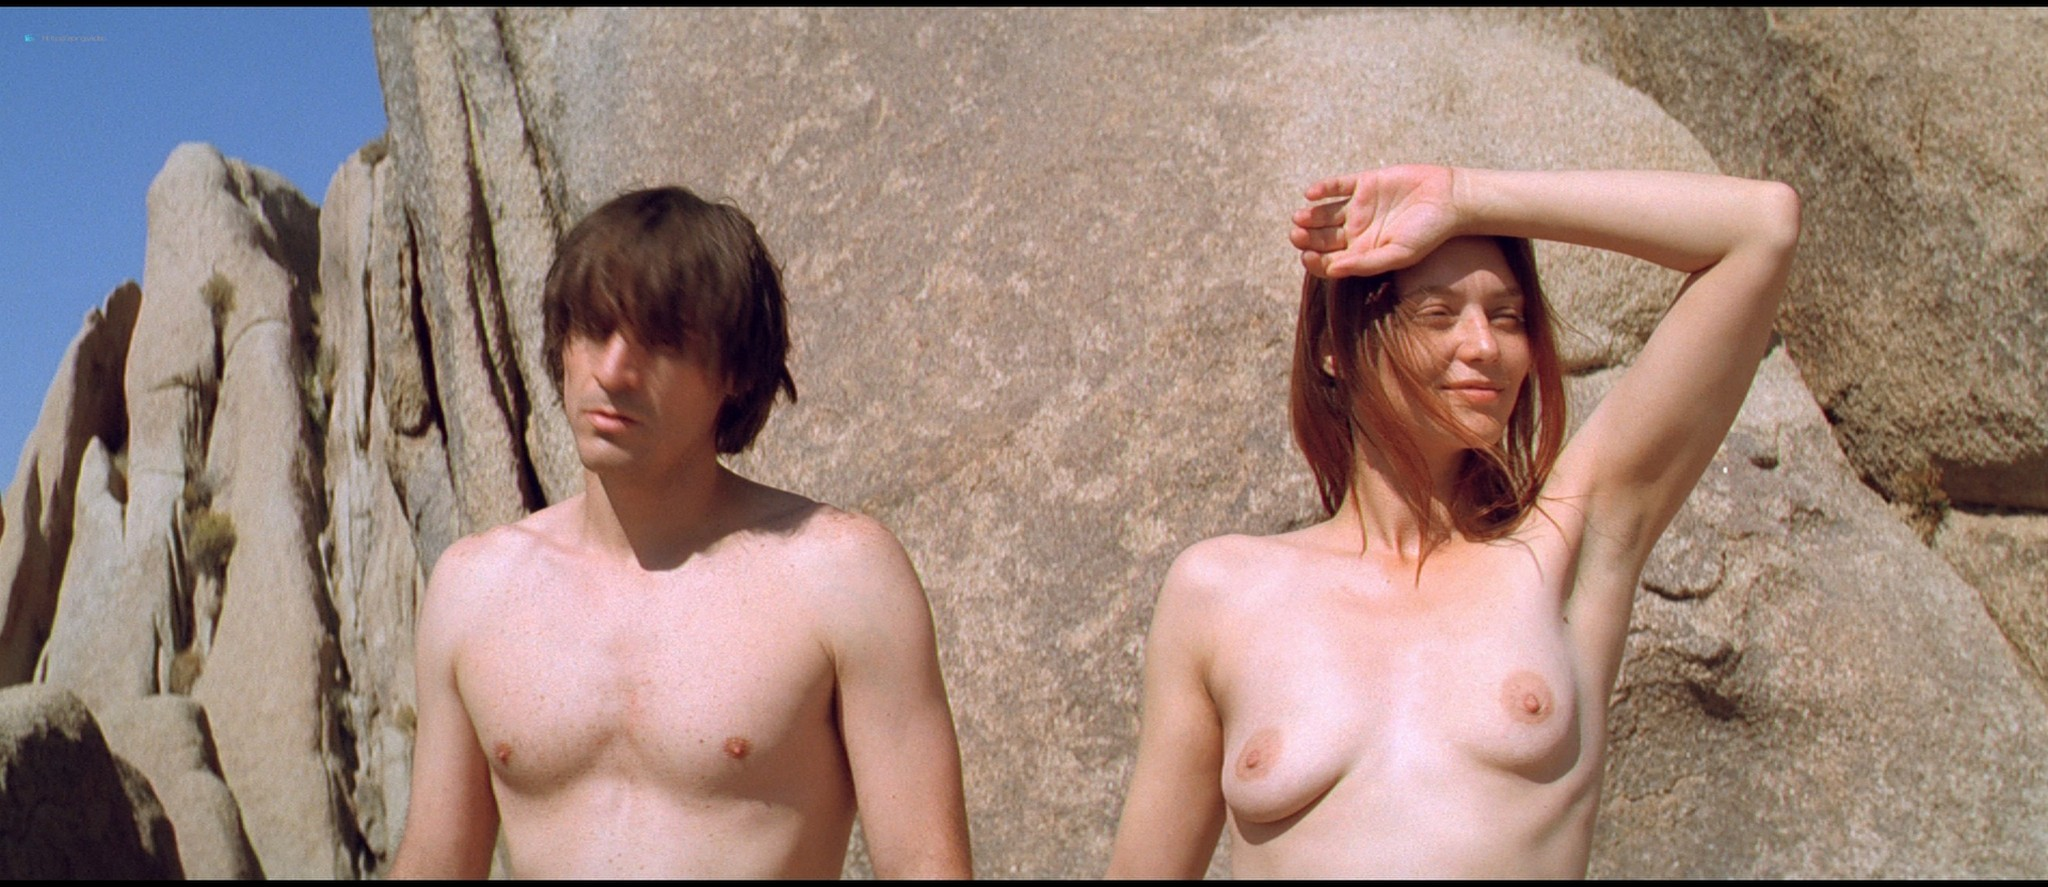 Yekaterina Golubeva nude full frontal explicit sex - Twentynine Palms (2003) HD 1080p BluRay REMUX (15)